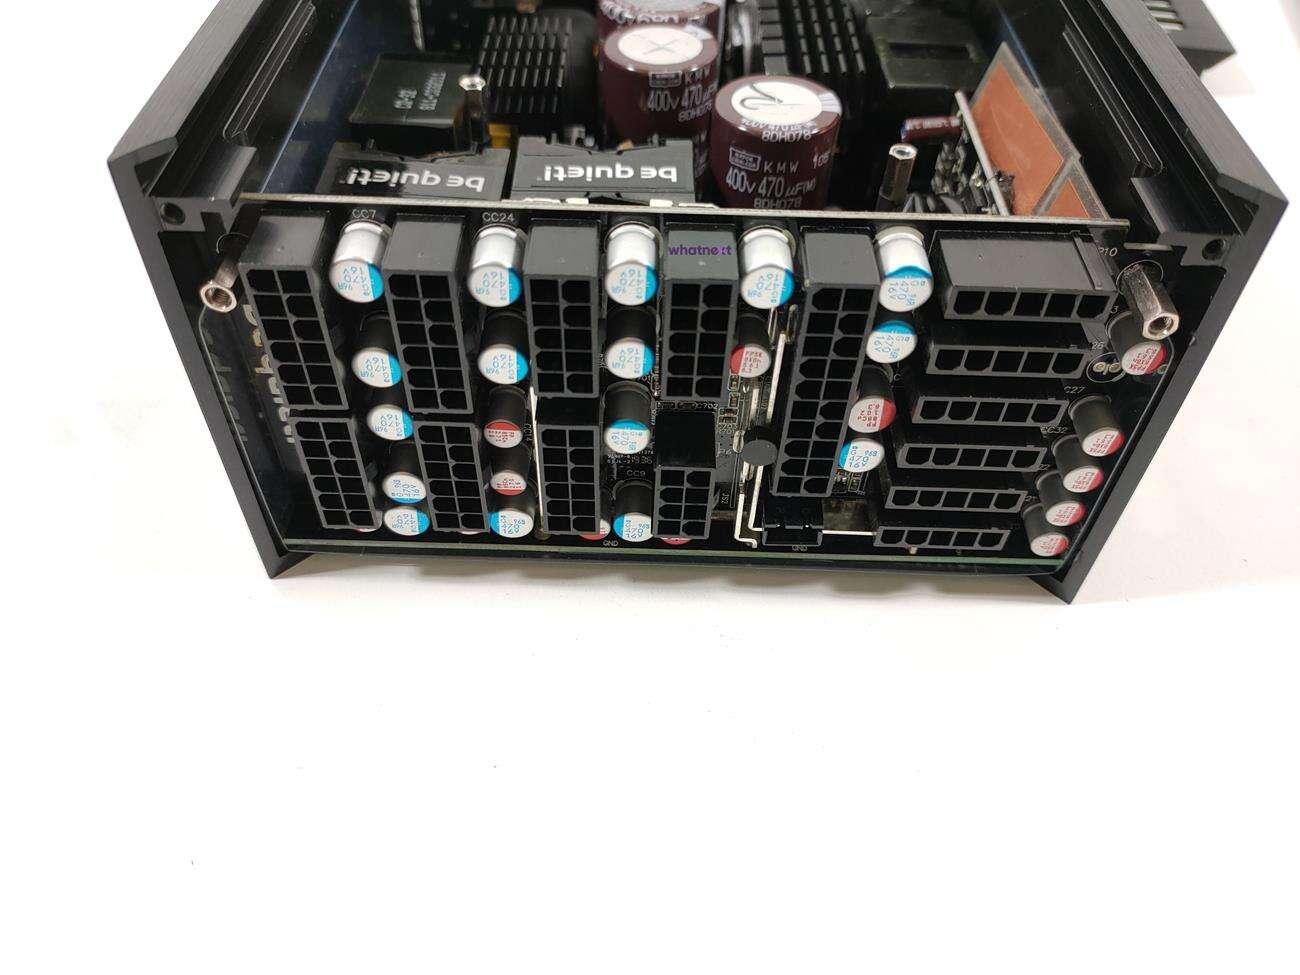 test be quiet! Dark Power Pro 12 1200W, recenzja be quiet! Dark Power Pro 12 1200W, review be quiet! Dark Power Pro 12 1200W, opinia be quiet! Dark Power Pro 12 1200W